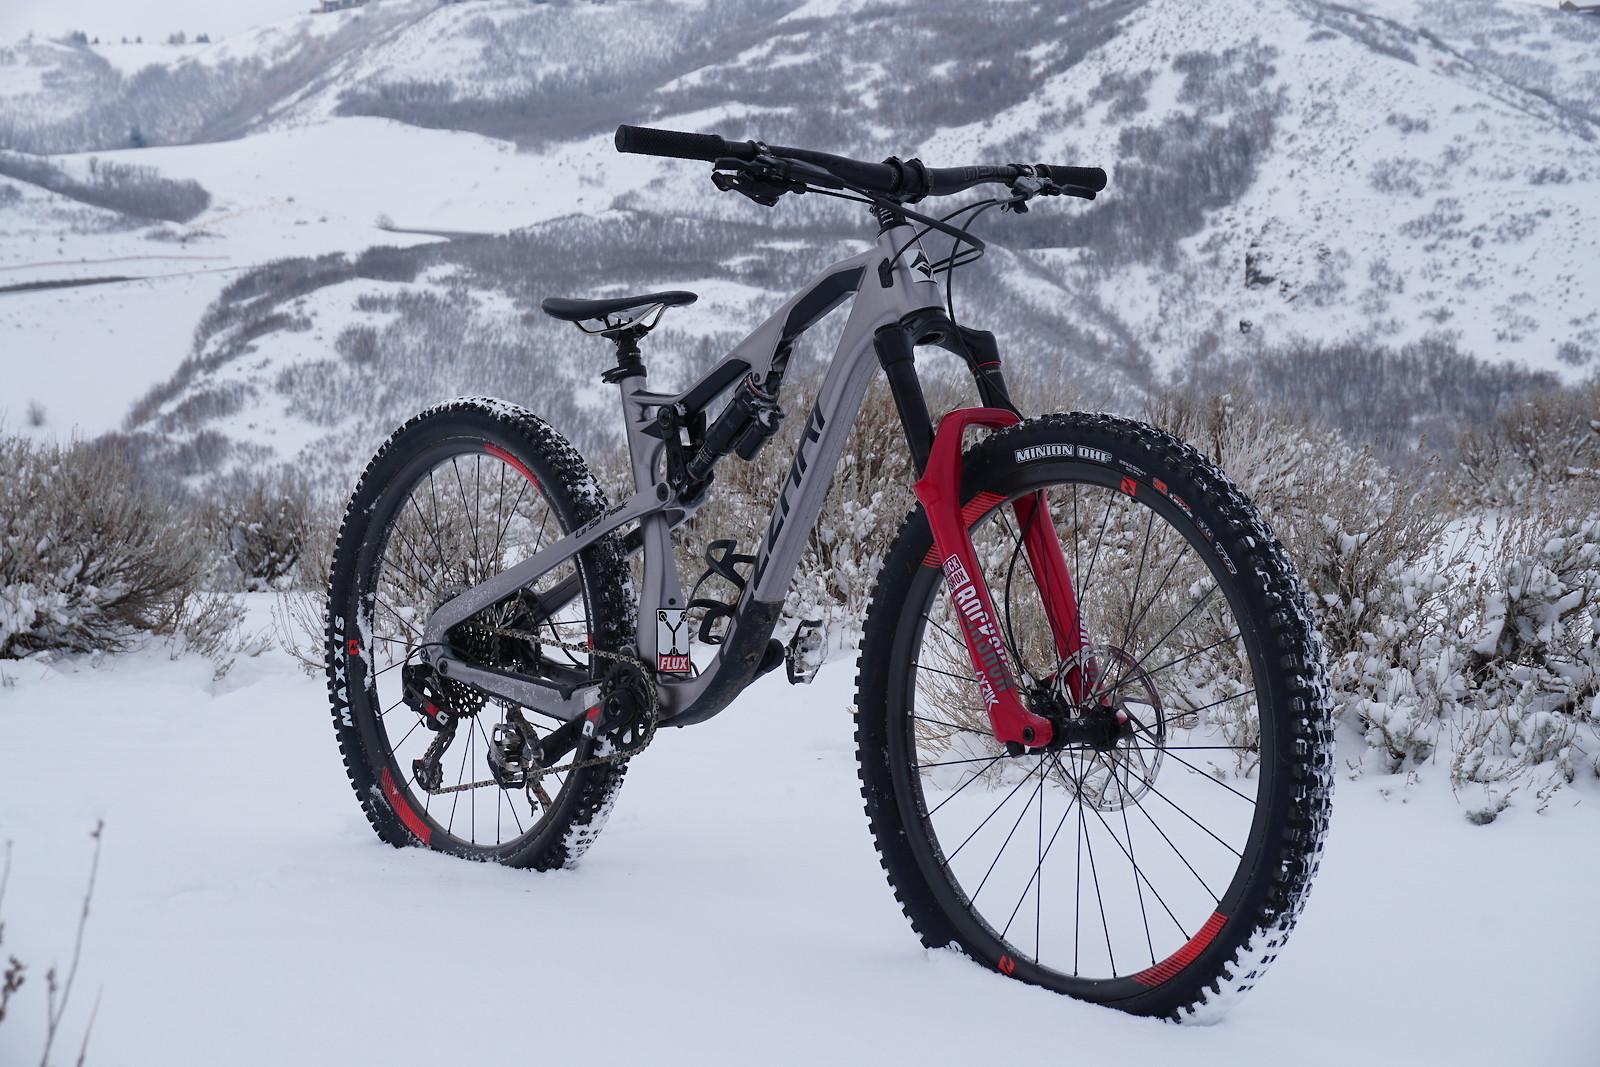 Fezzari La Sal Peak - 2019 Vital Bike of the Day Collection - Mountain Biking Pictures - Vital MTB